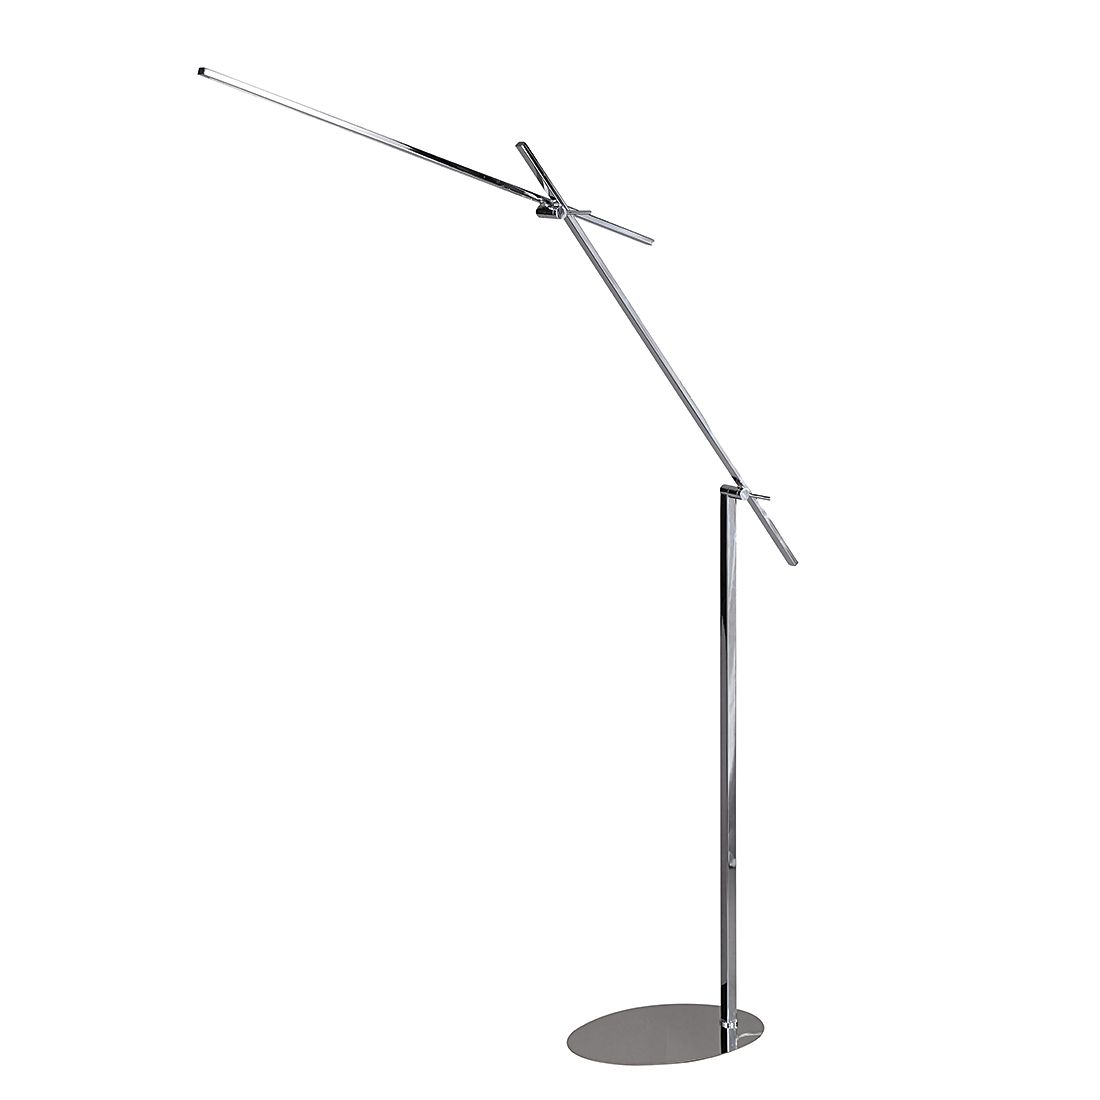 energie  A+, Staande lamp ORBIT - metaal/kunststof - 1 lichtbron, Wofi